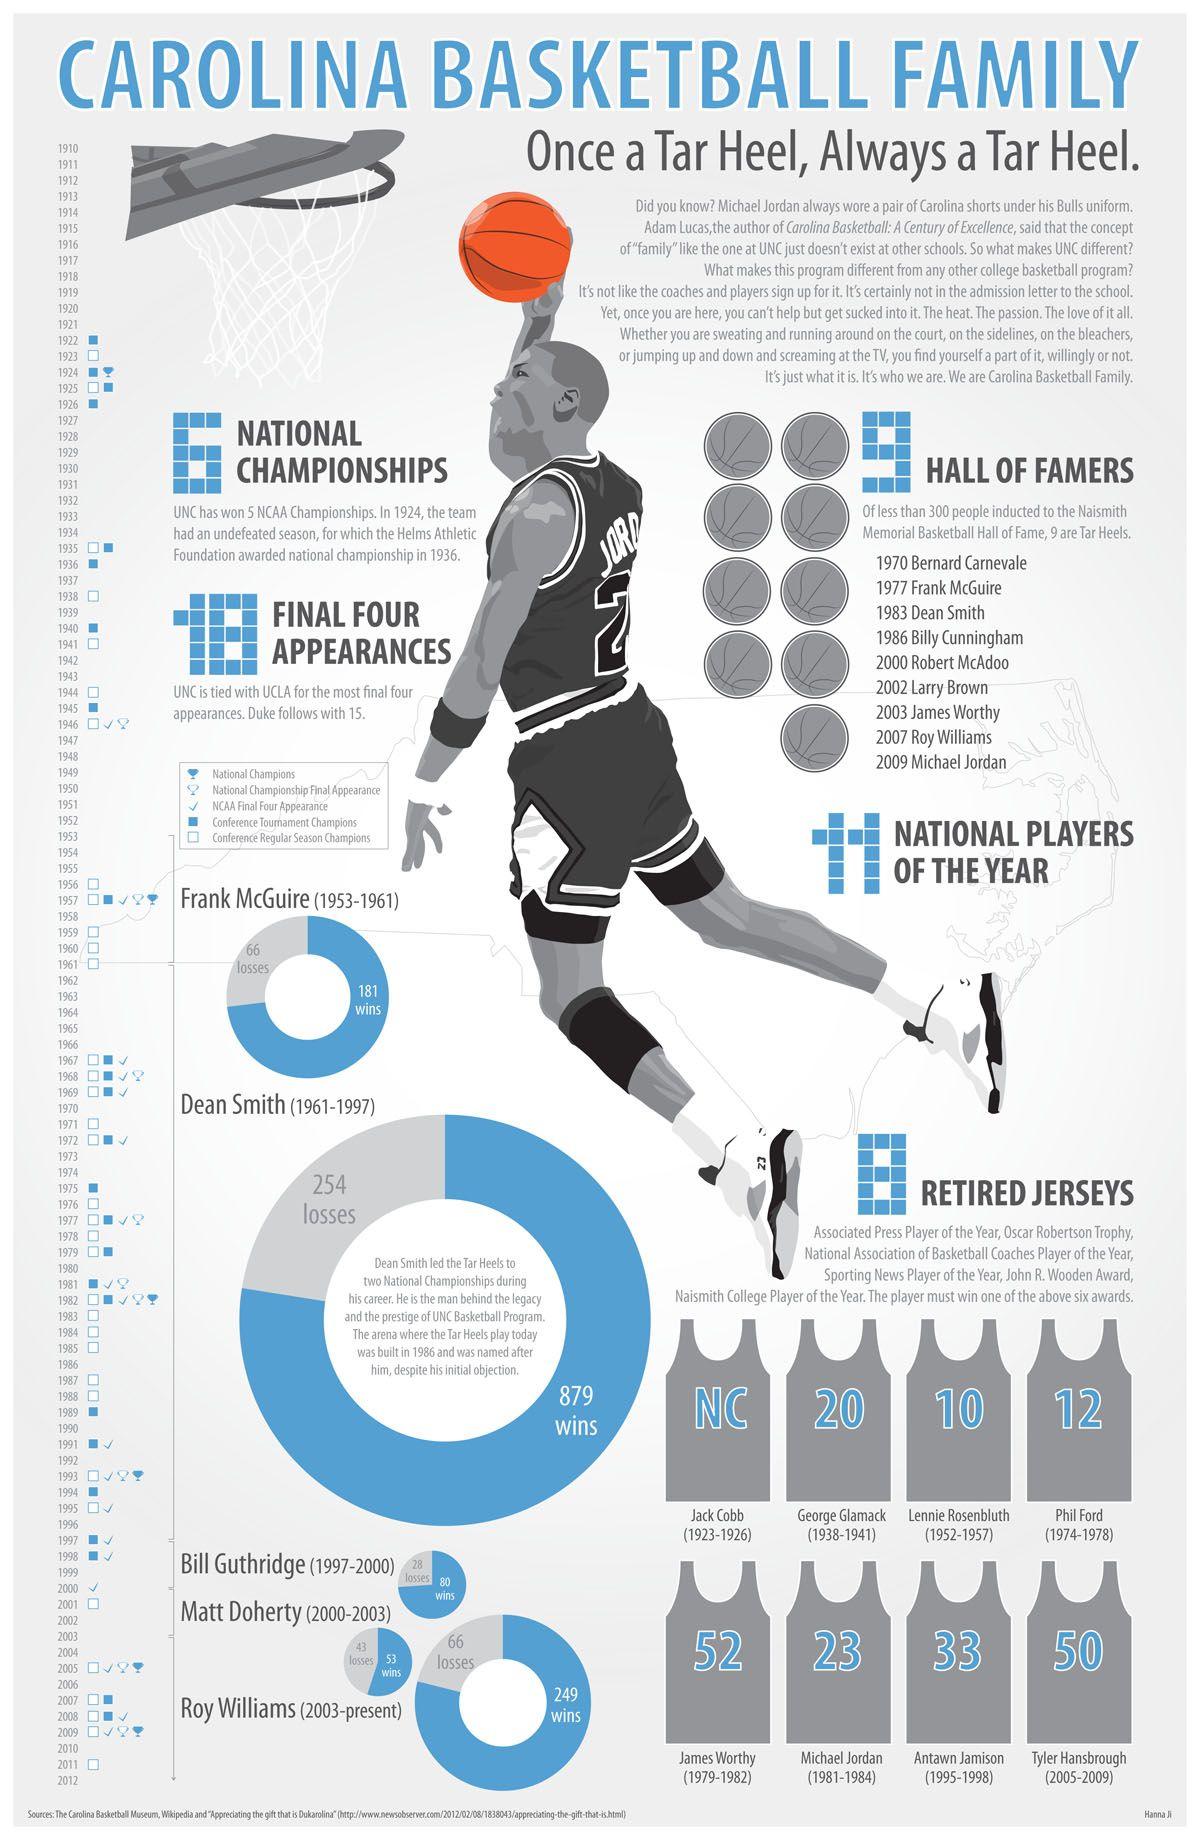 Carolina Basketball - Nothing Better